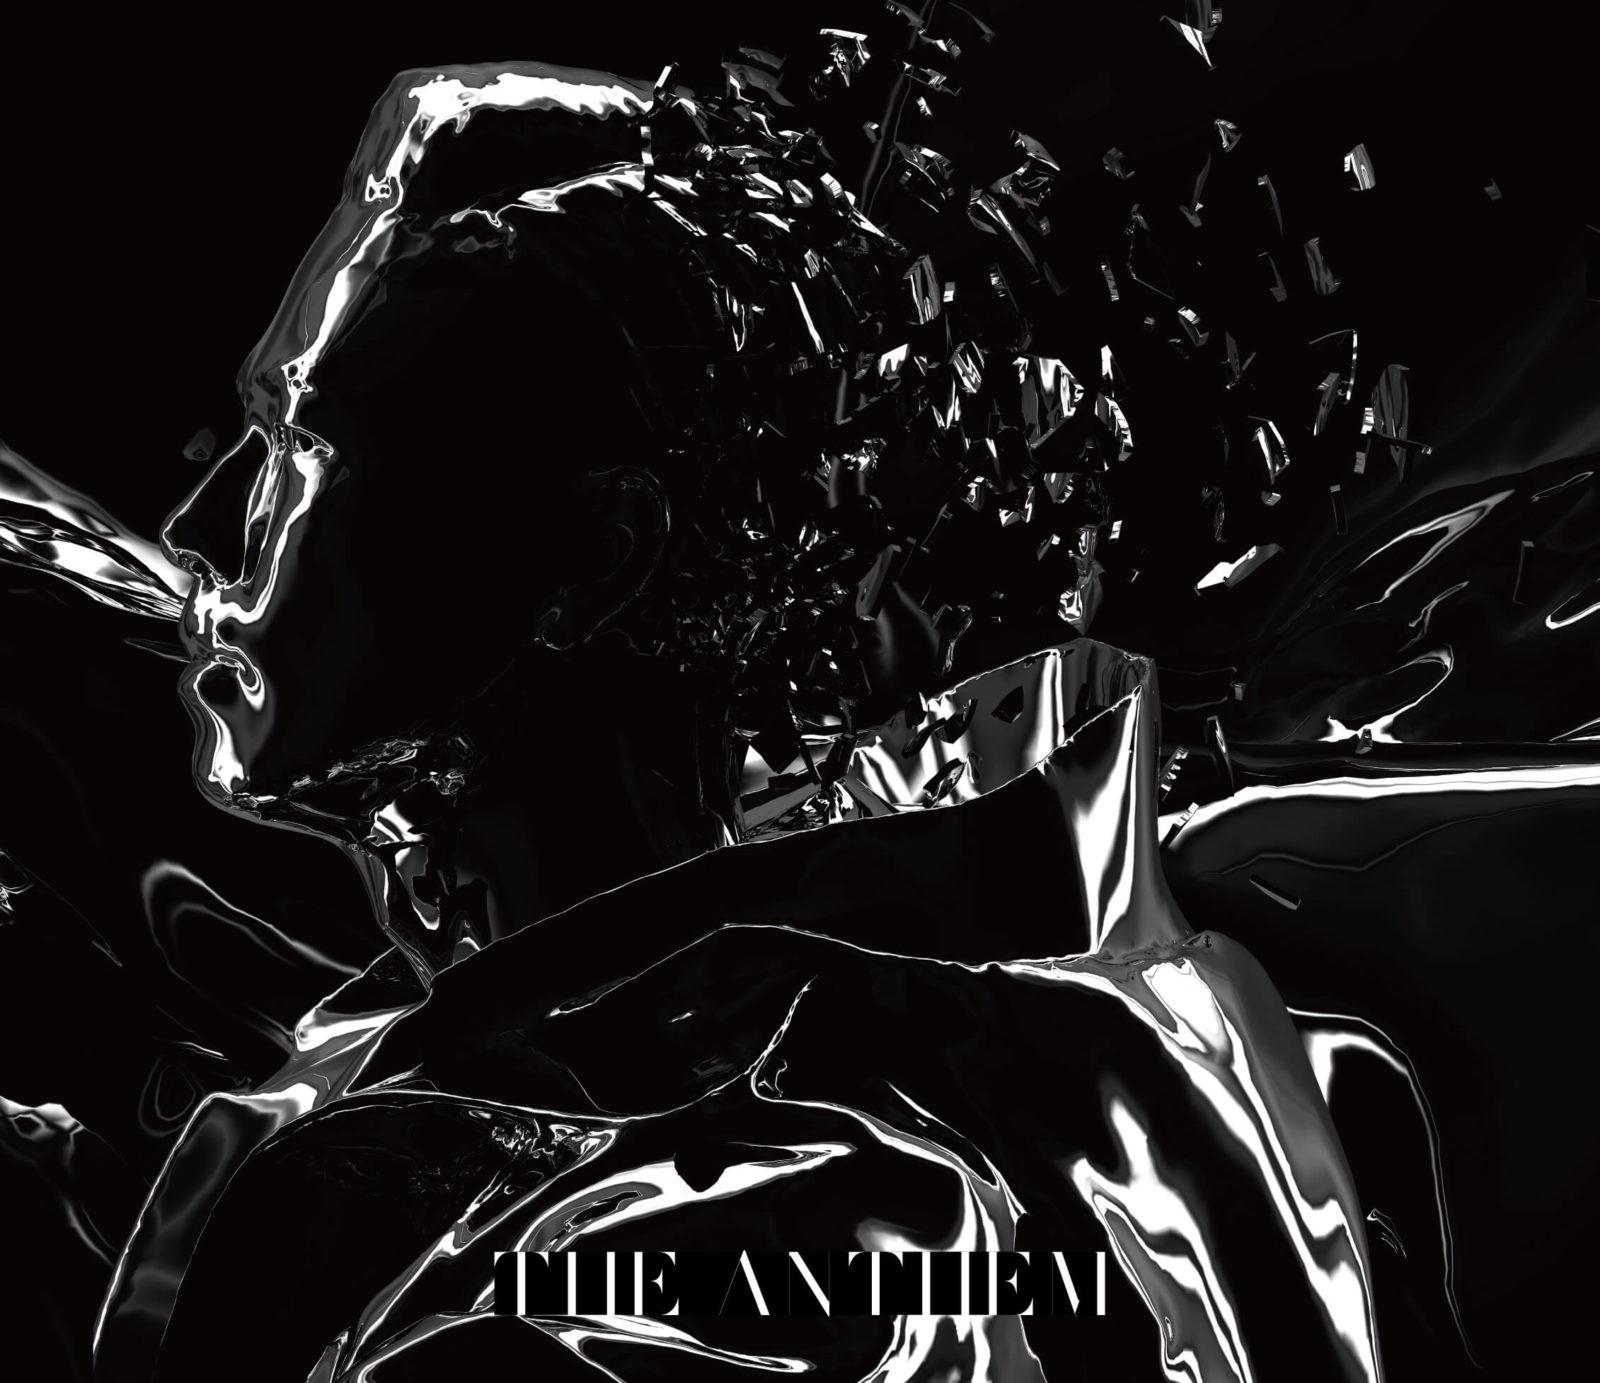 AK-69、Def Jam Recordings 2ndアルバム『THE ANTHEM』の全収録曲タイトル、ジャケット・アートワークが公開サムネイル画像